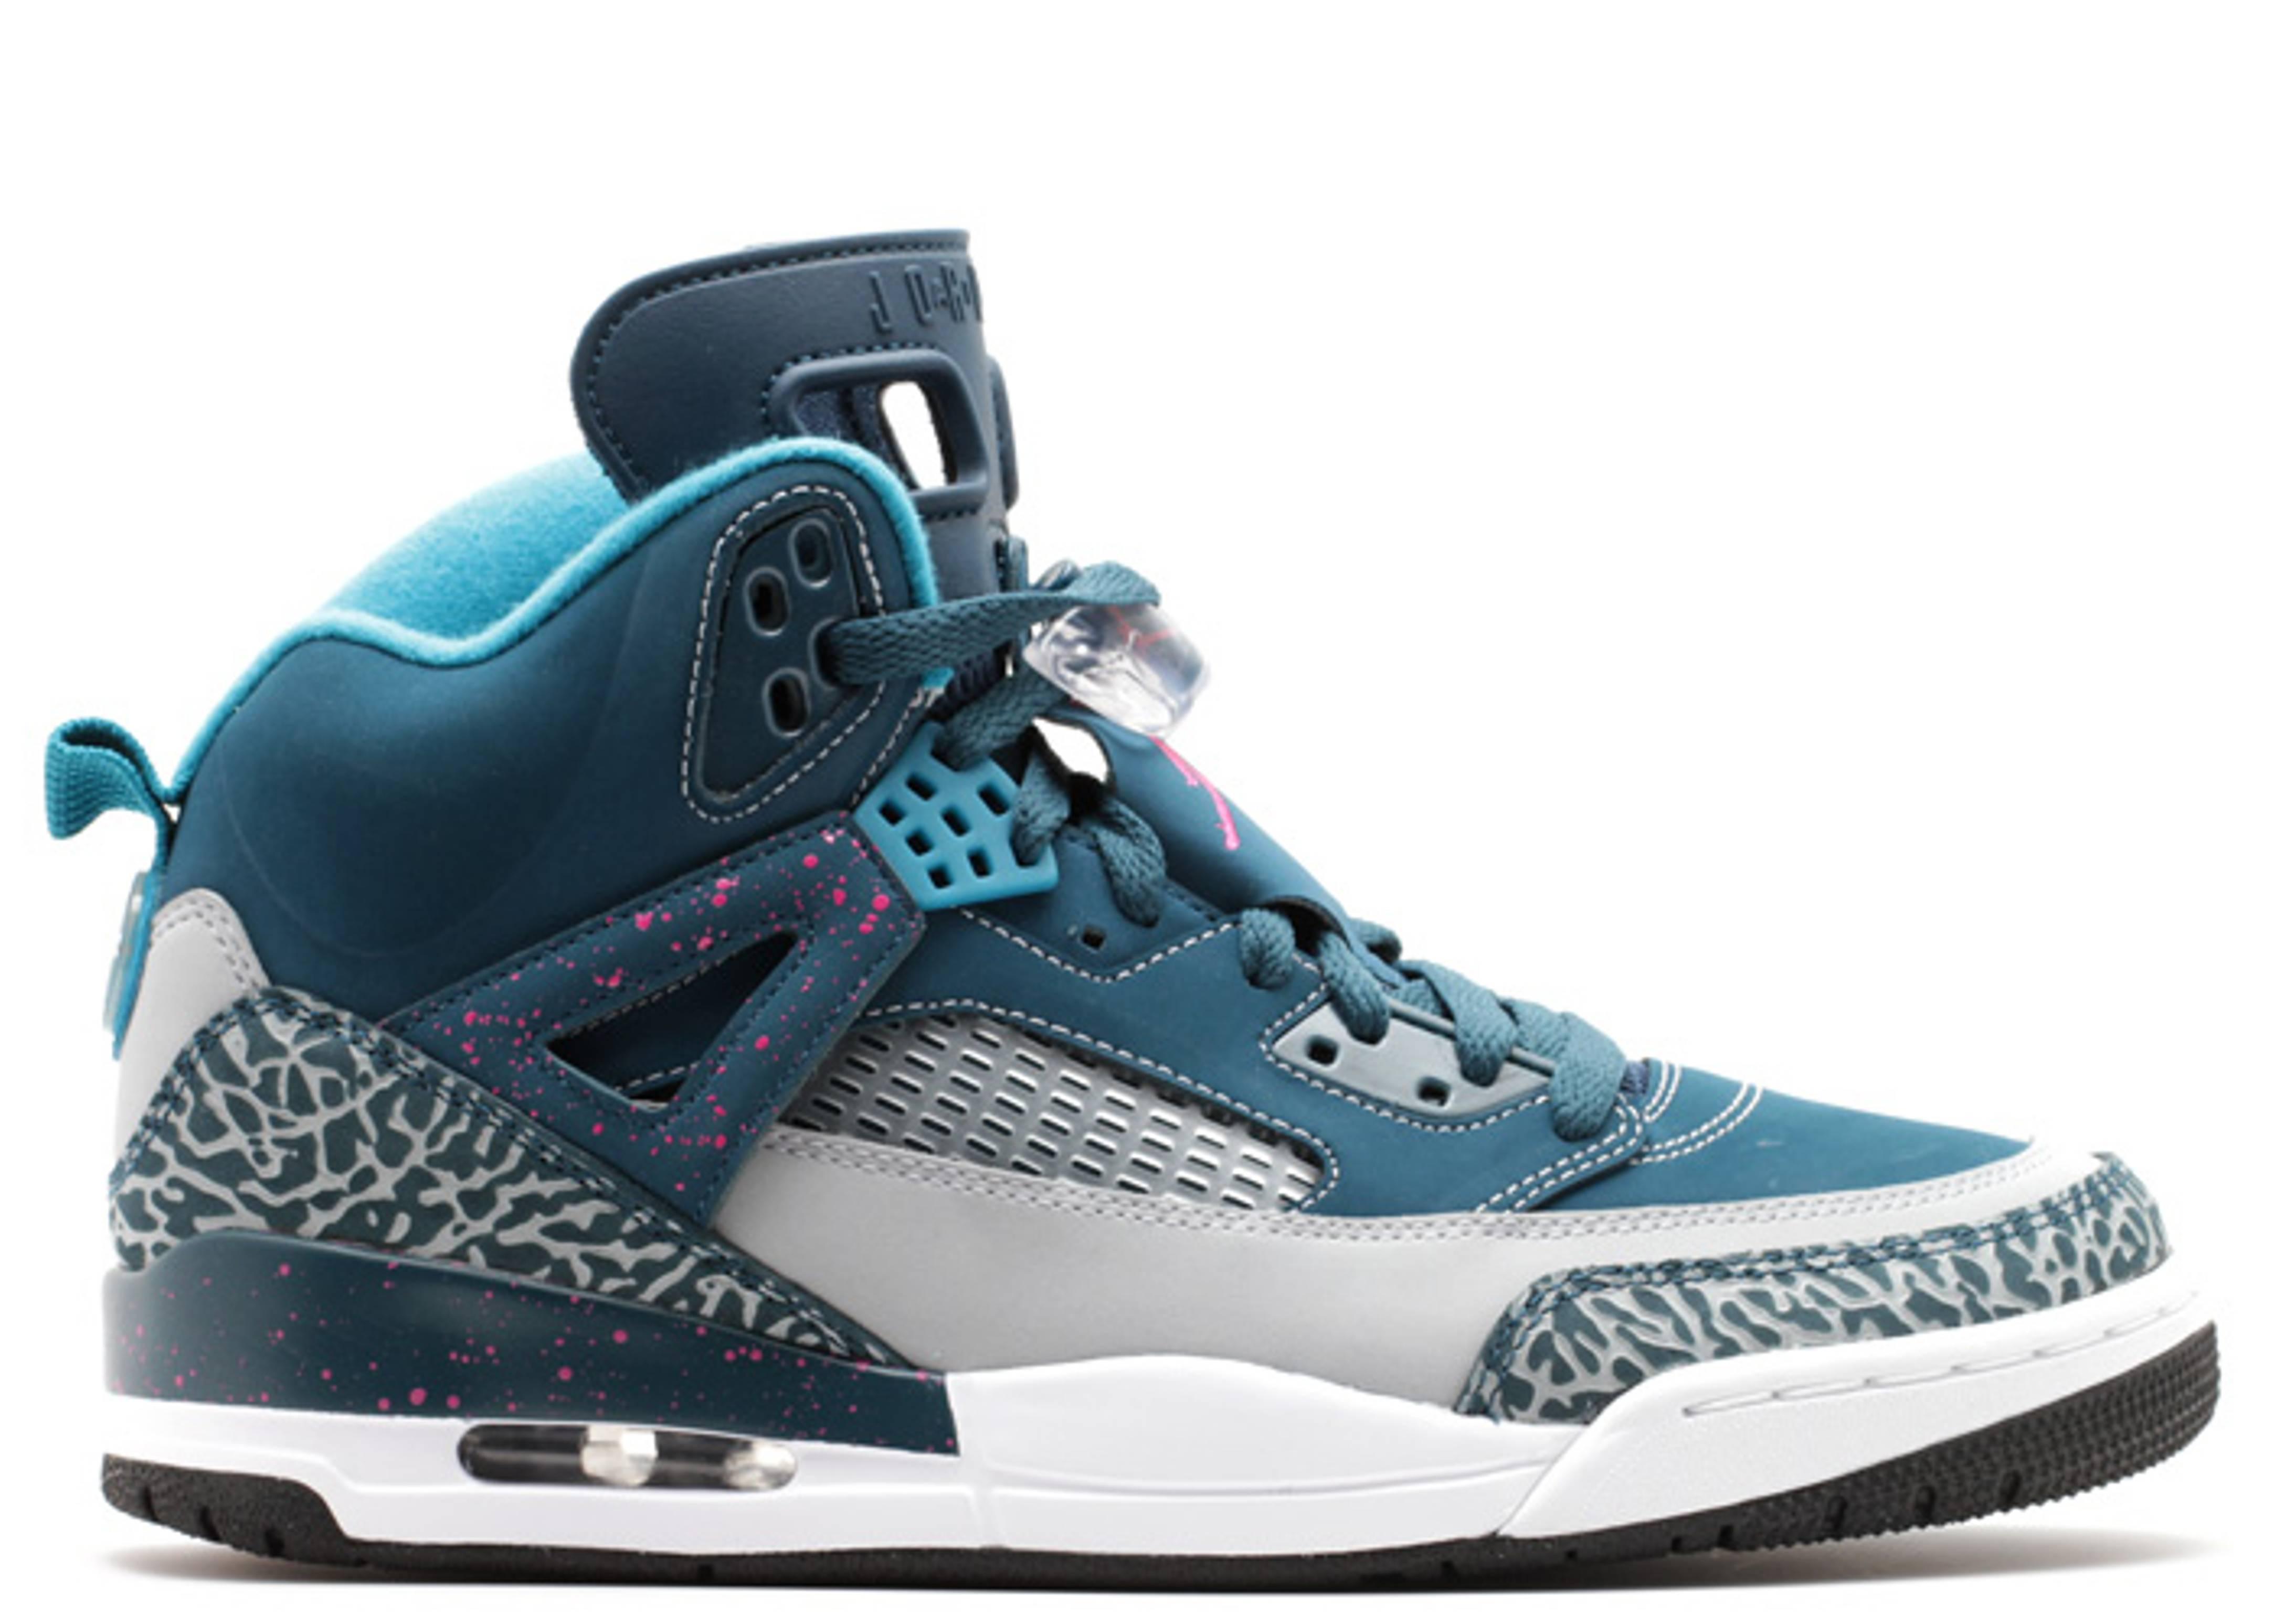 Air Jordan Spiz'ike Sneakers   Flight Club